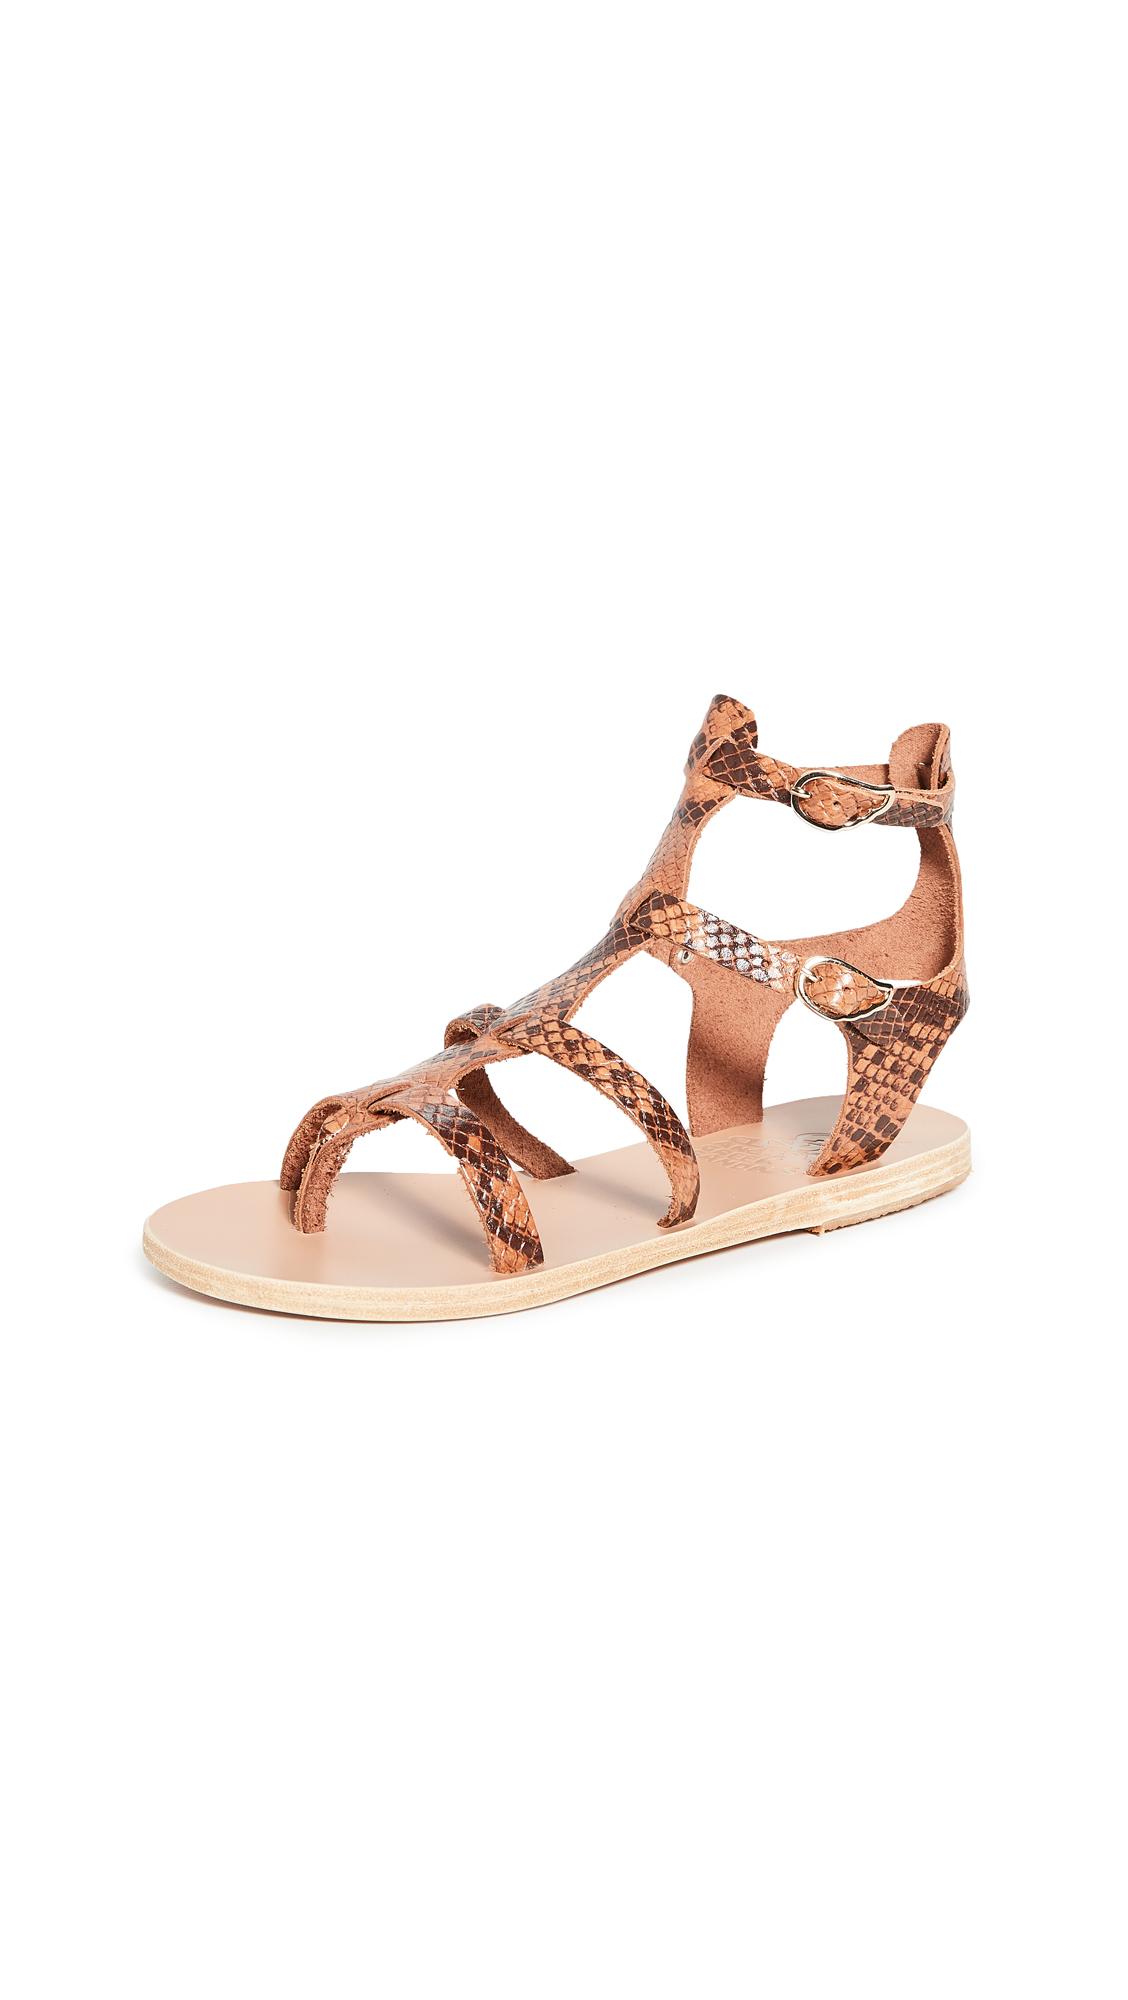 Buy Ancient Greek Sandals Stephanie Sandals online, shop Ancient Greek Sandals